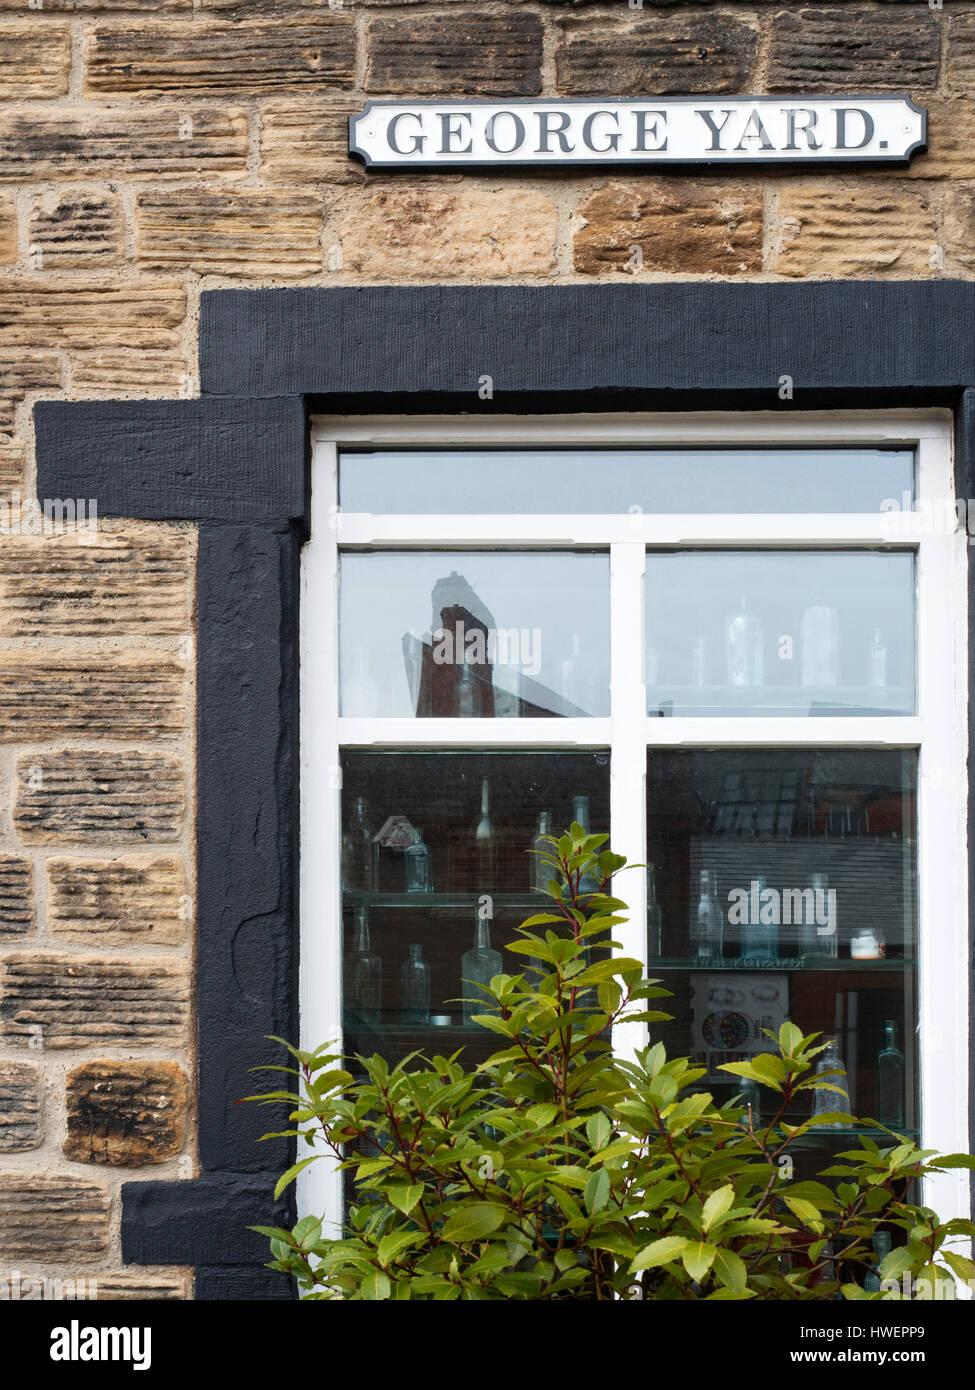 The Old Chemist Restaurant in George Yard Hanson Street Barnsley South Yorkshire England - Stock Image